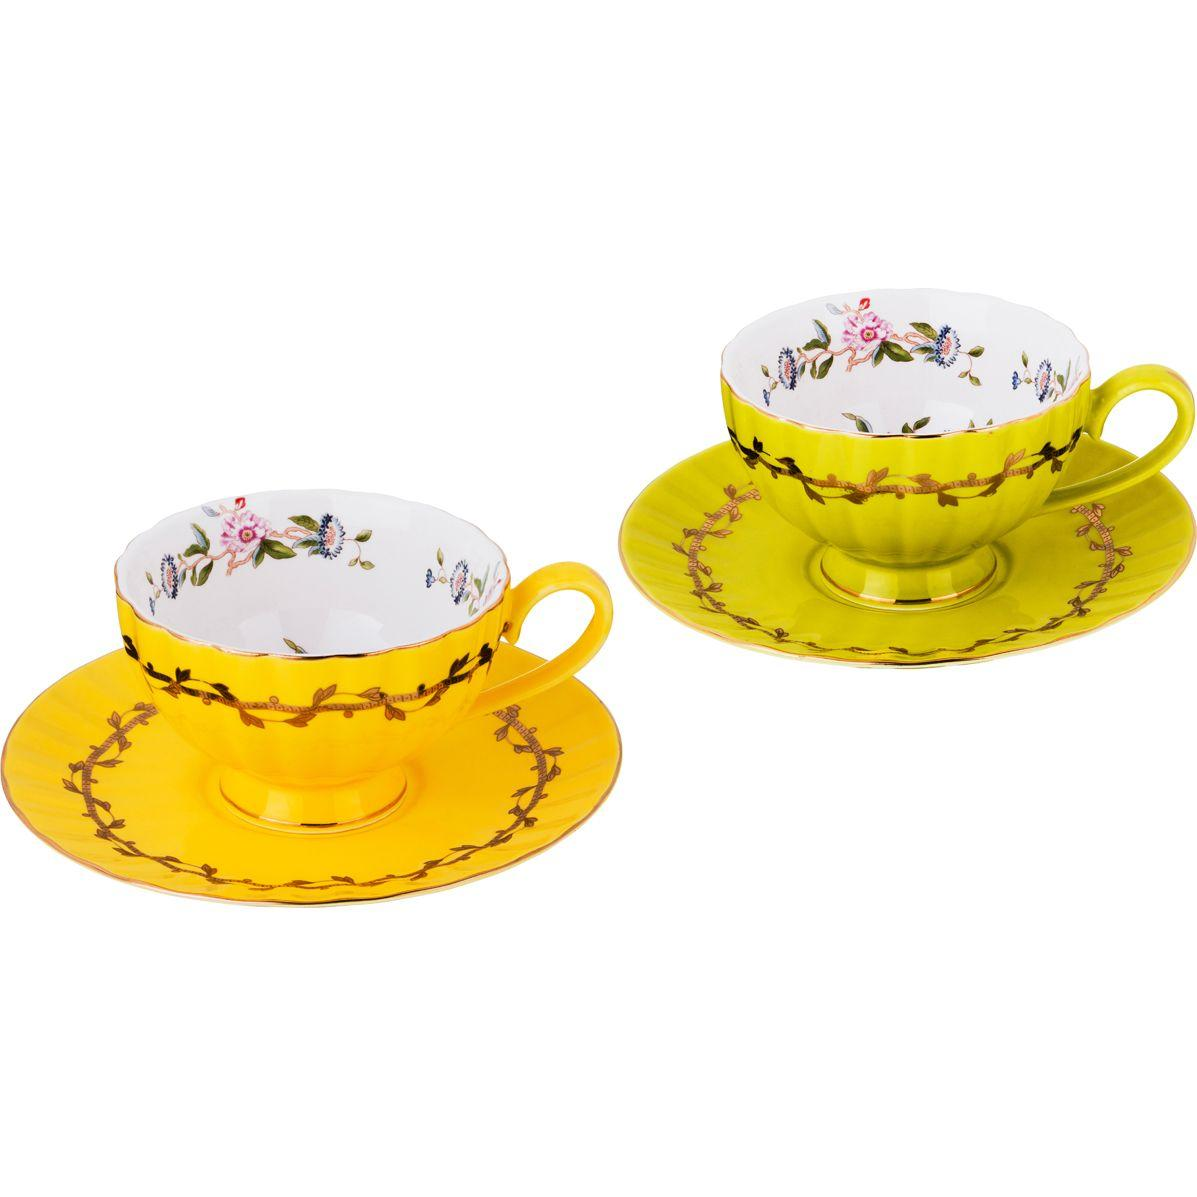 Чайный набор Lefard на 2 персоны